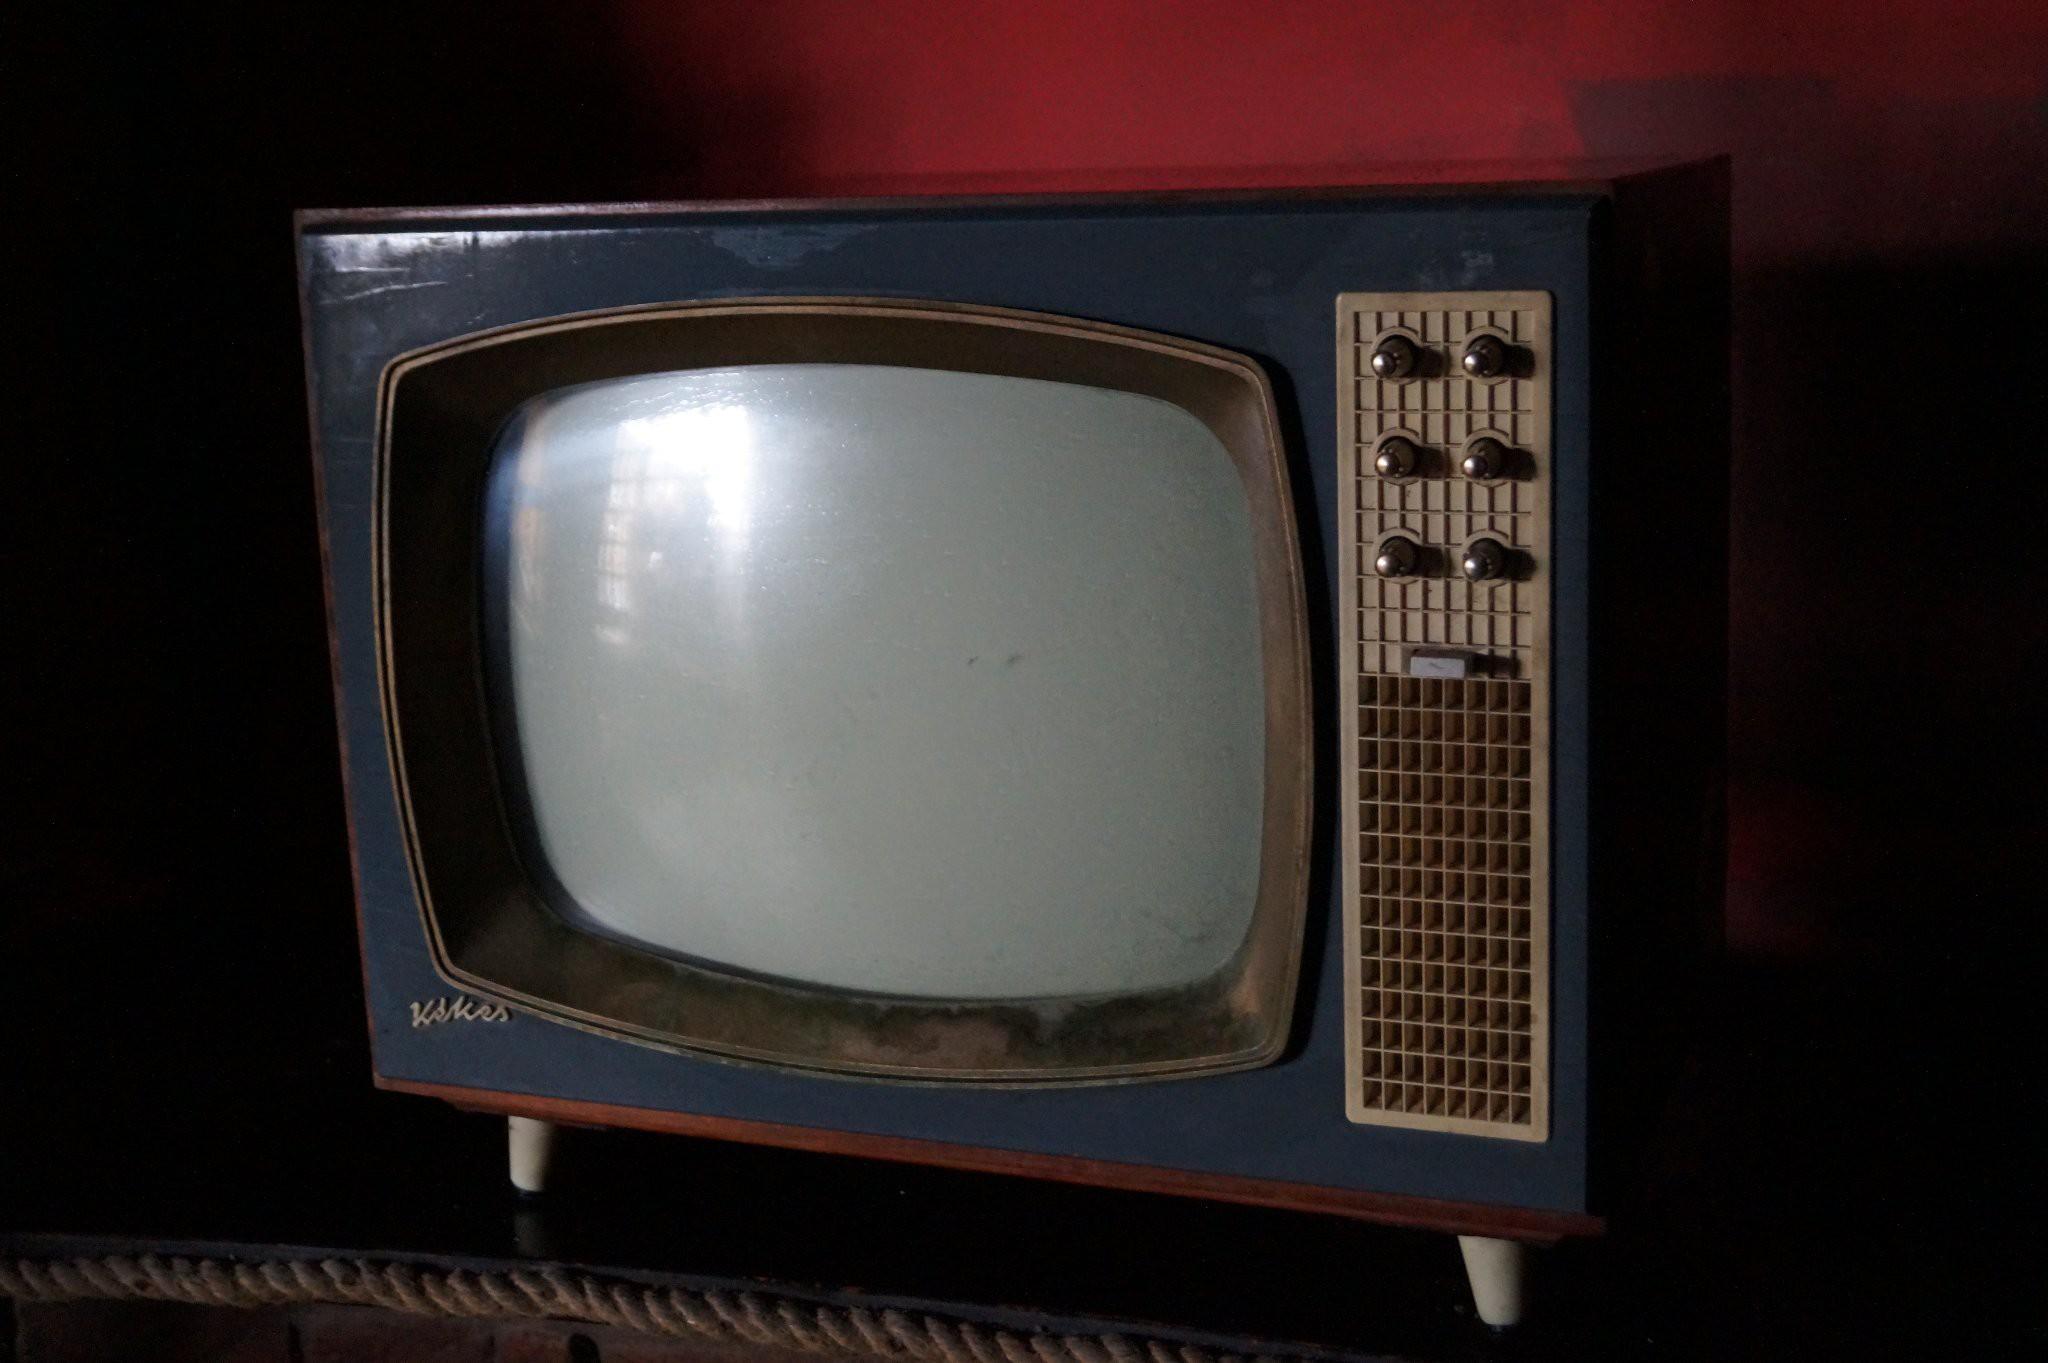 d8c1697cabd78a94fe63b27ddf2a8ada-kekes-tv-retro-televizio.jpg